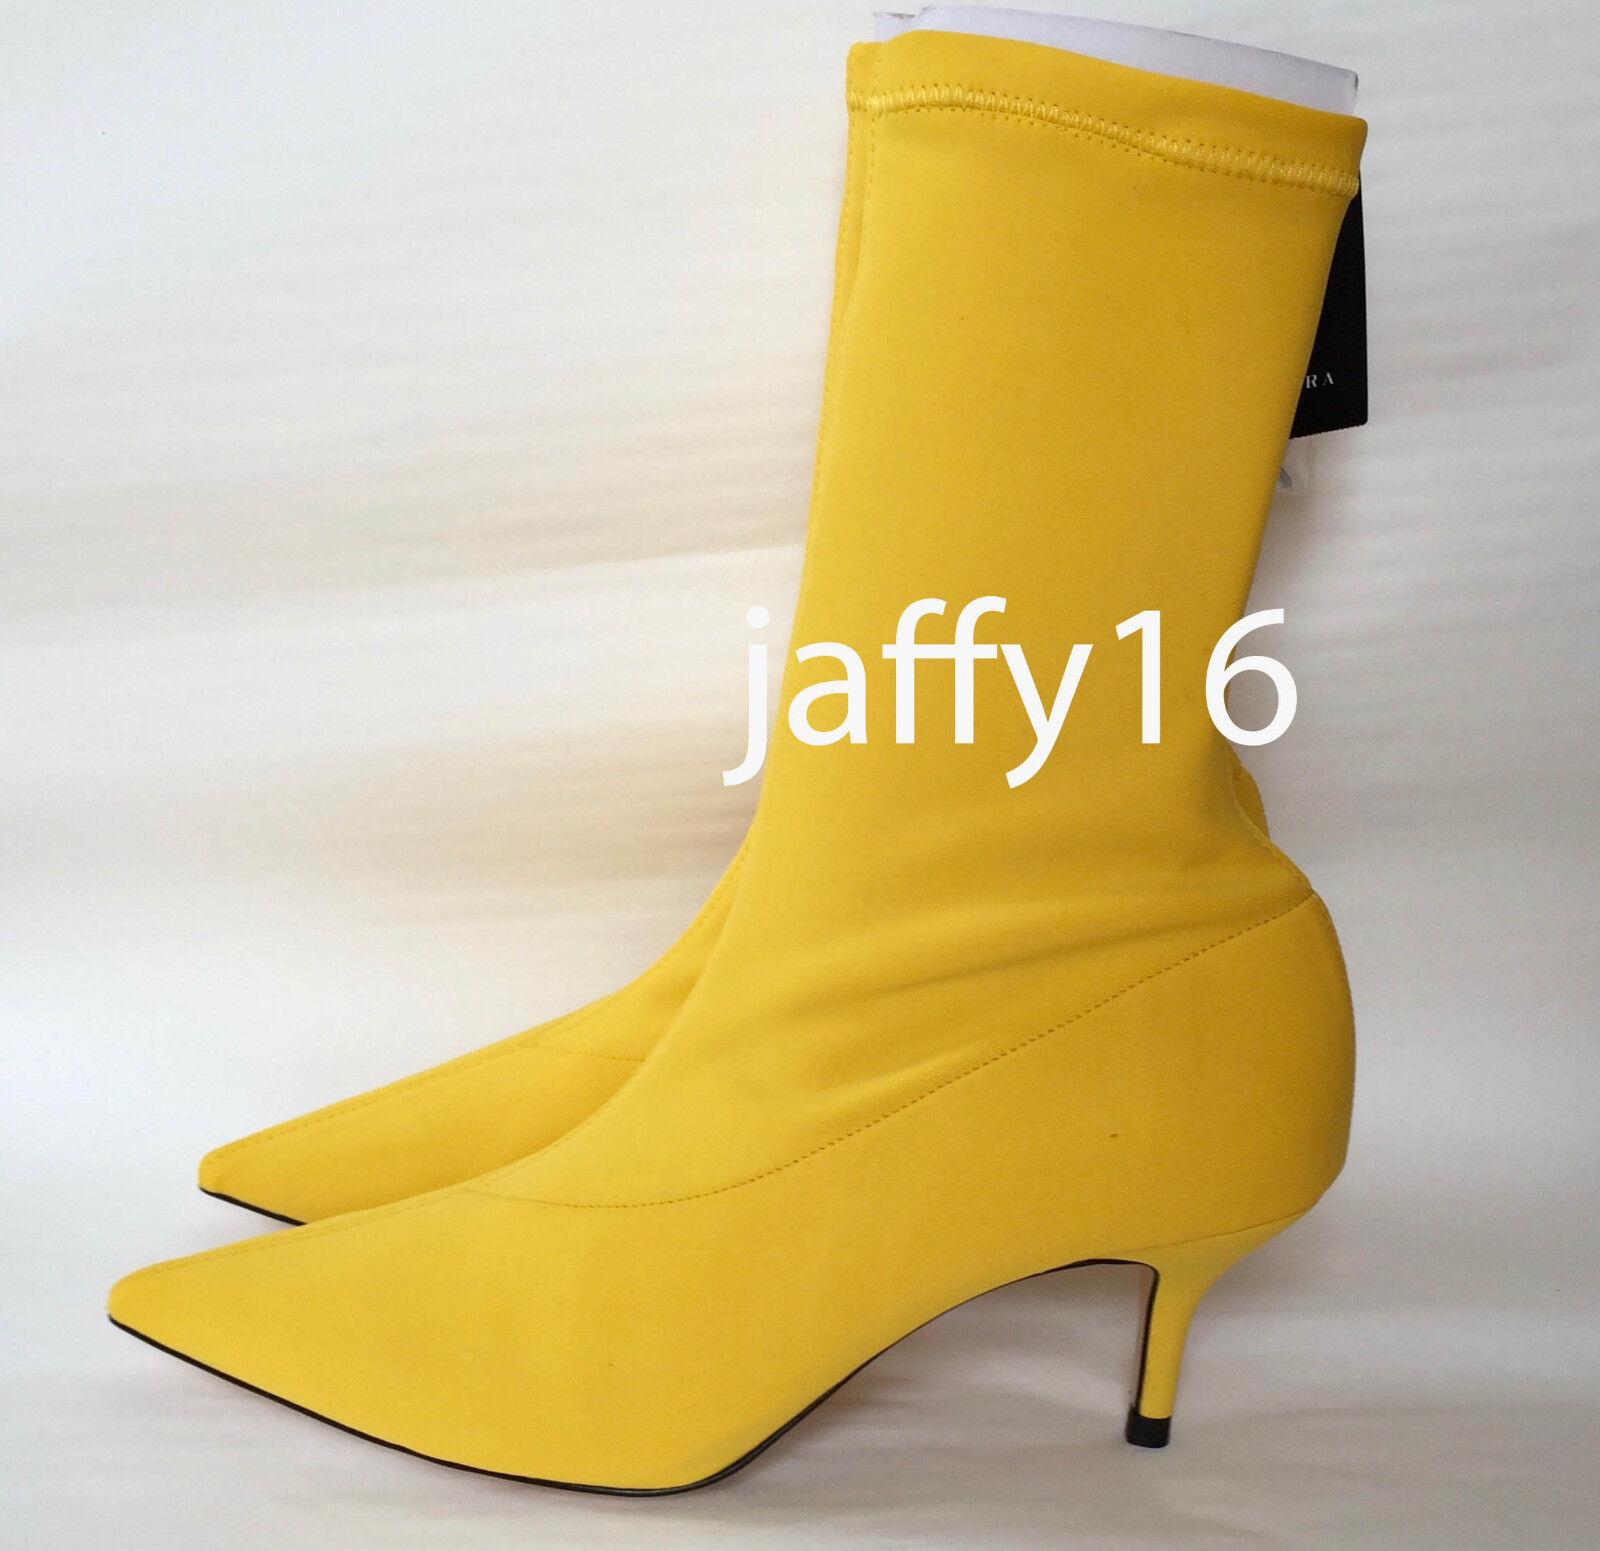 ZARA ZARA ZARA FABRIC HIGH HEEL ANKLE bottes jaune 35-41 REF. 5118 201 0d2aaf